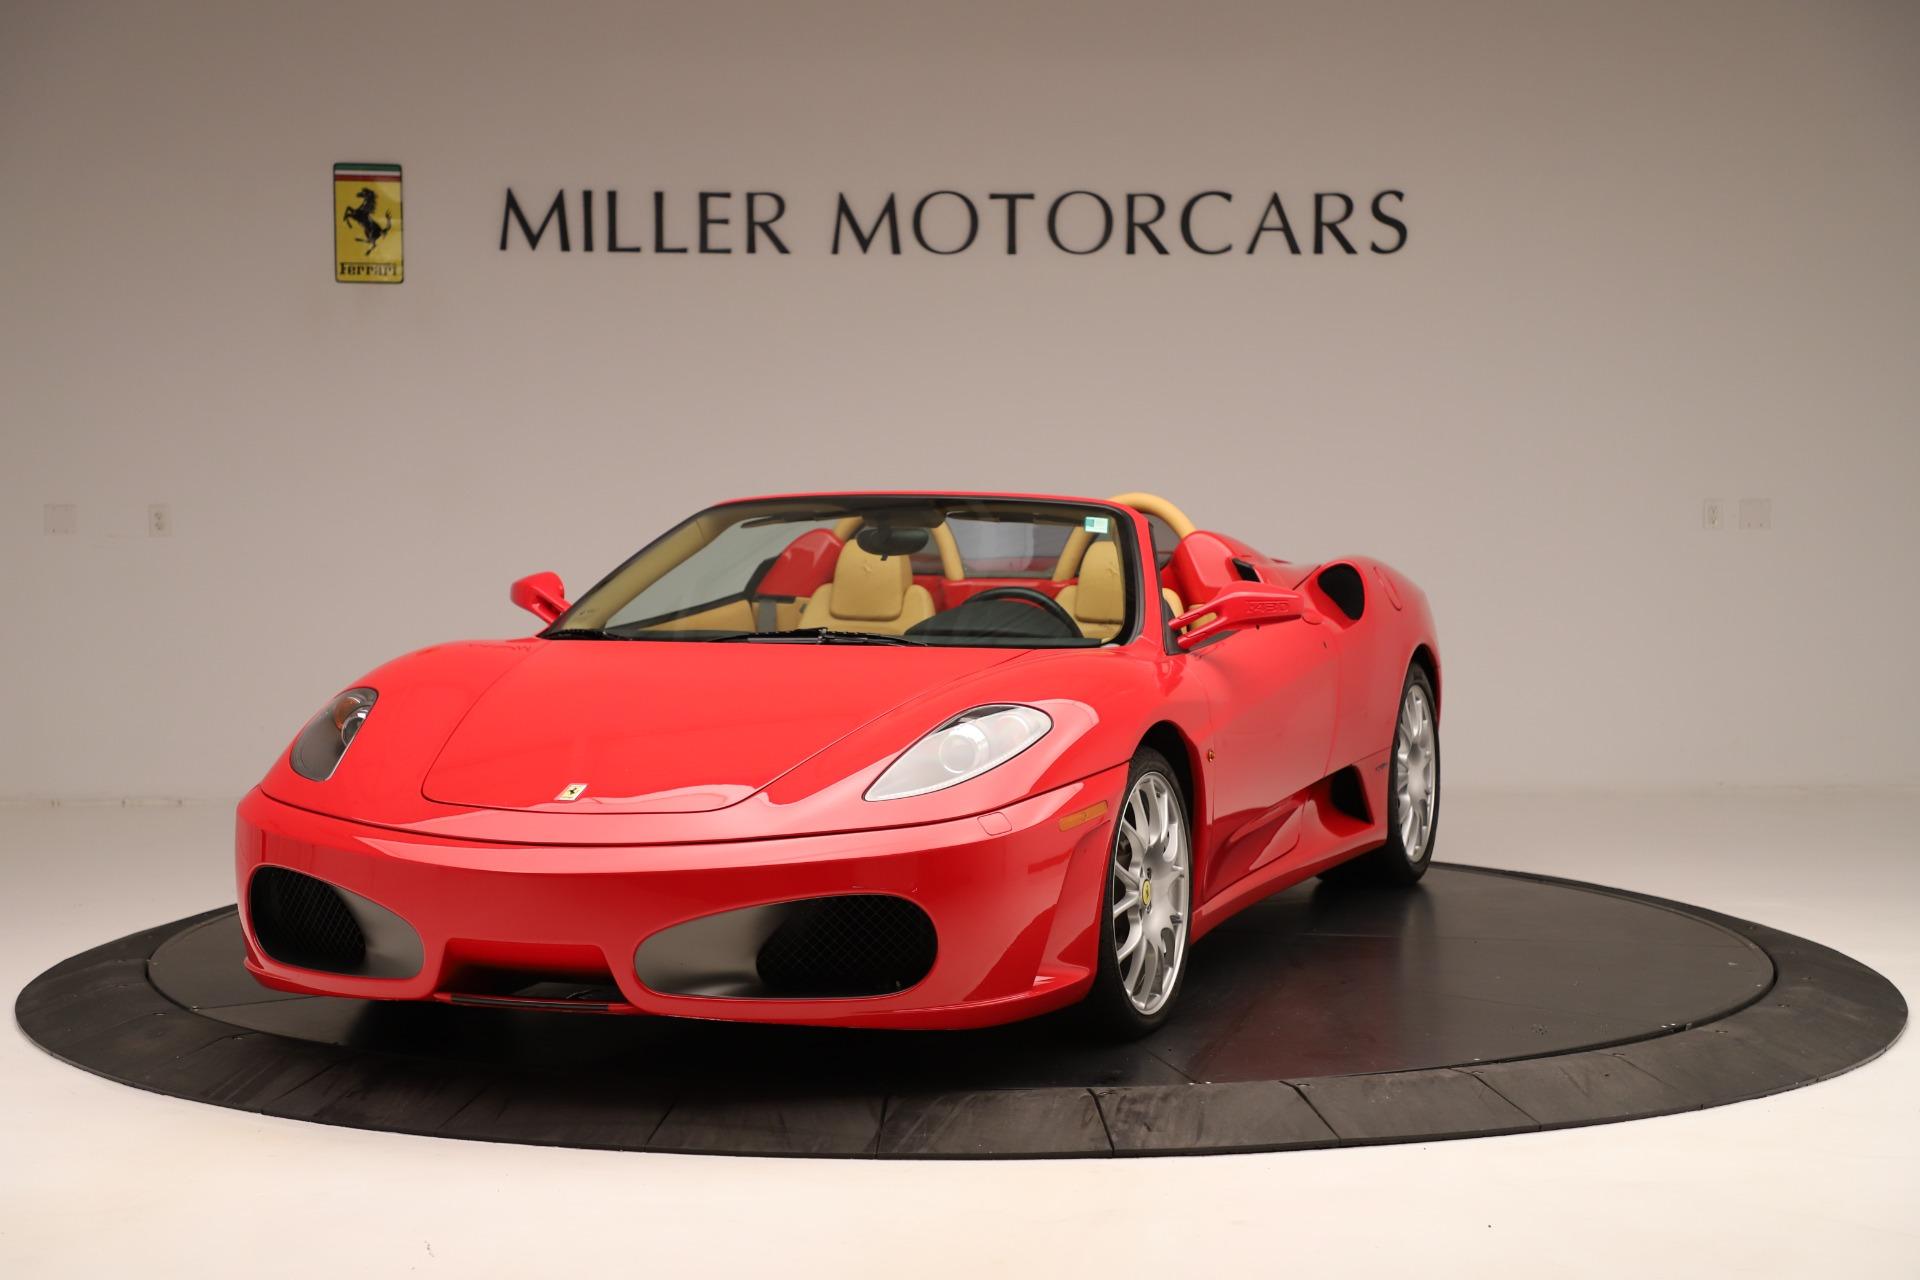 Used 2007 Ferrari F430 F1 Spider for sale Sold at Aston Martin of Greenwich in Greenwich CT 06830 1